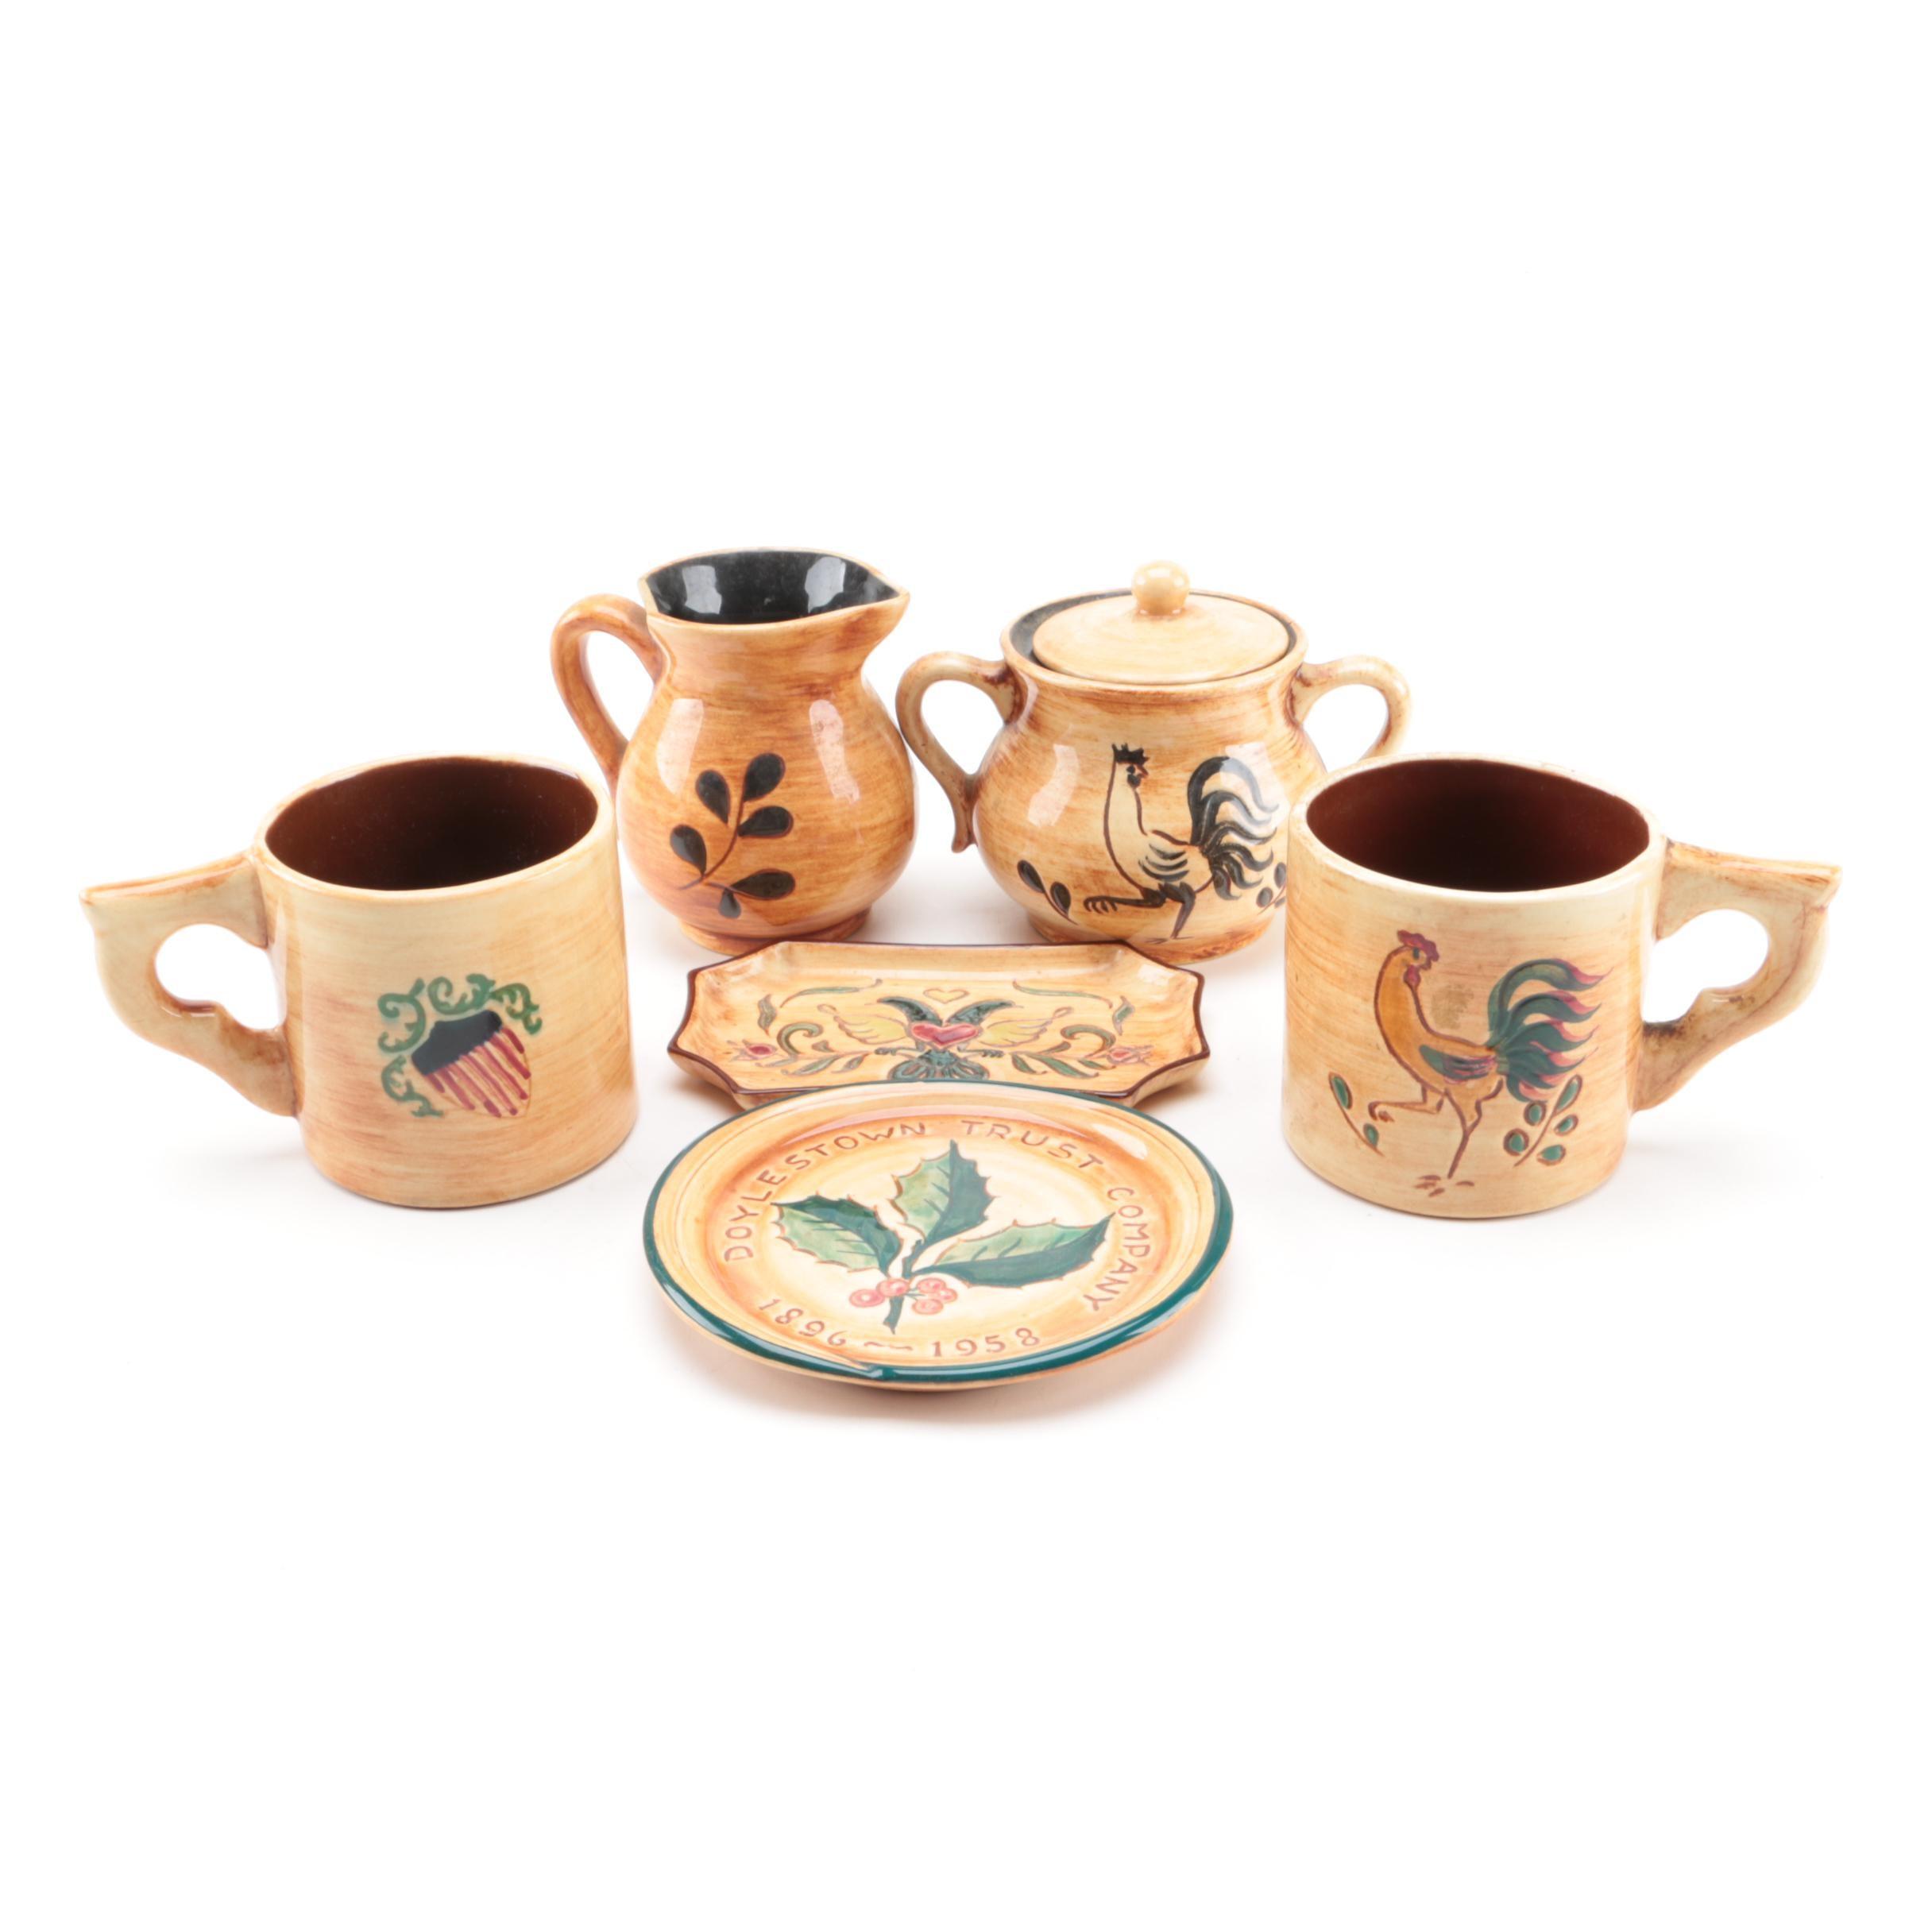 Pennsbury Pottery Tableware